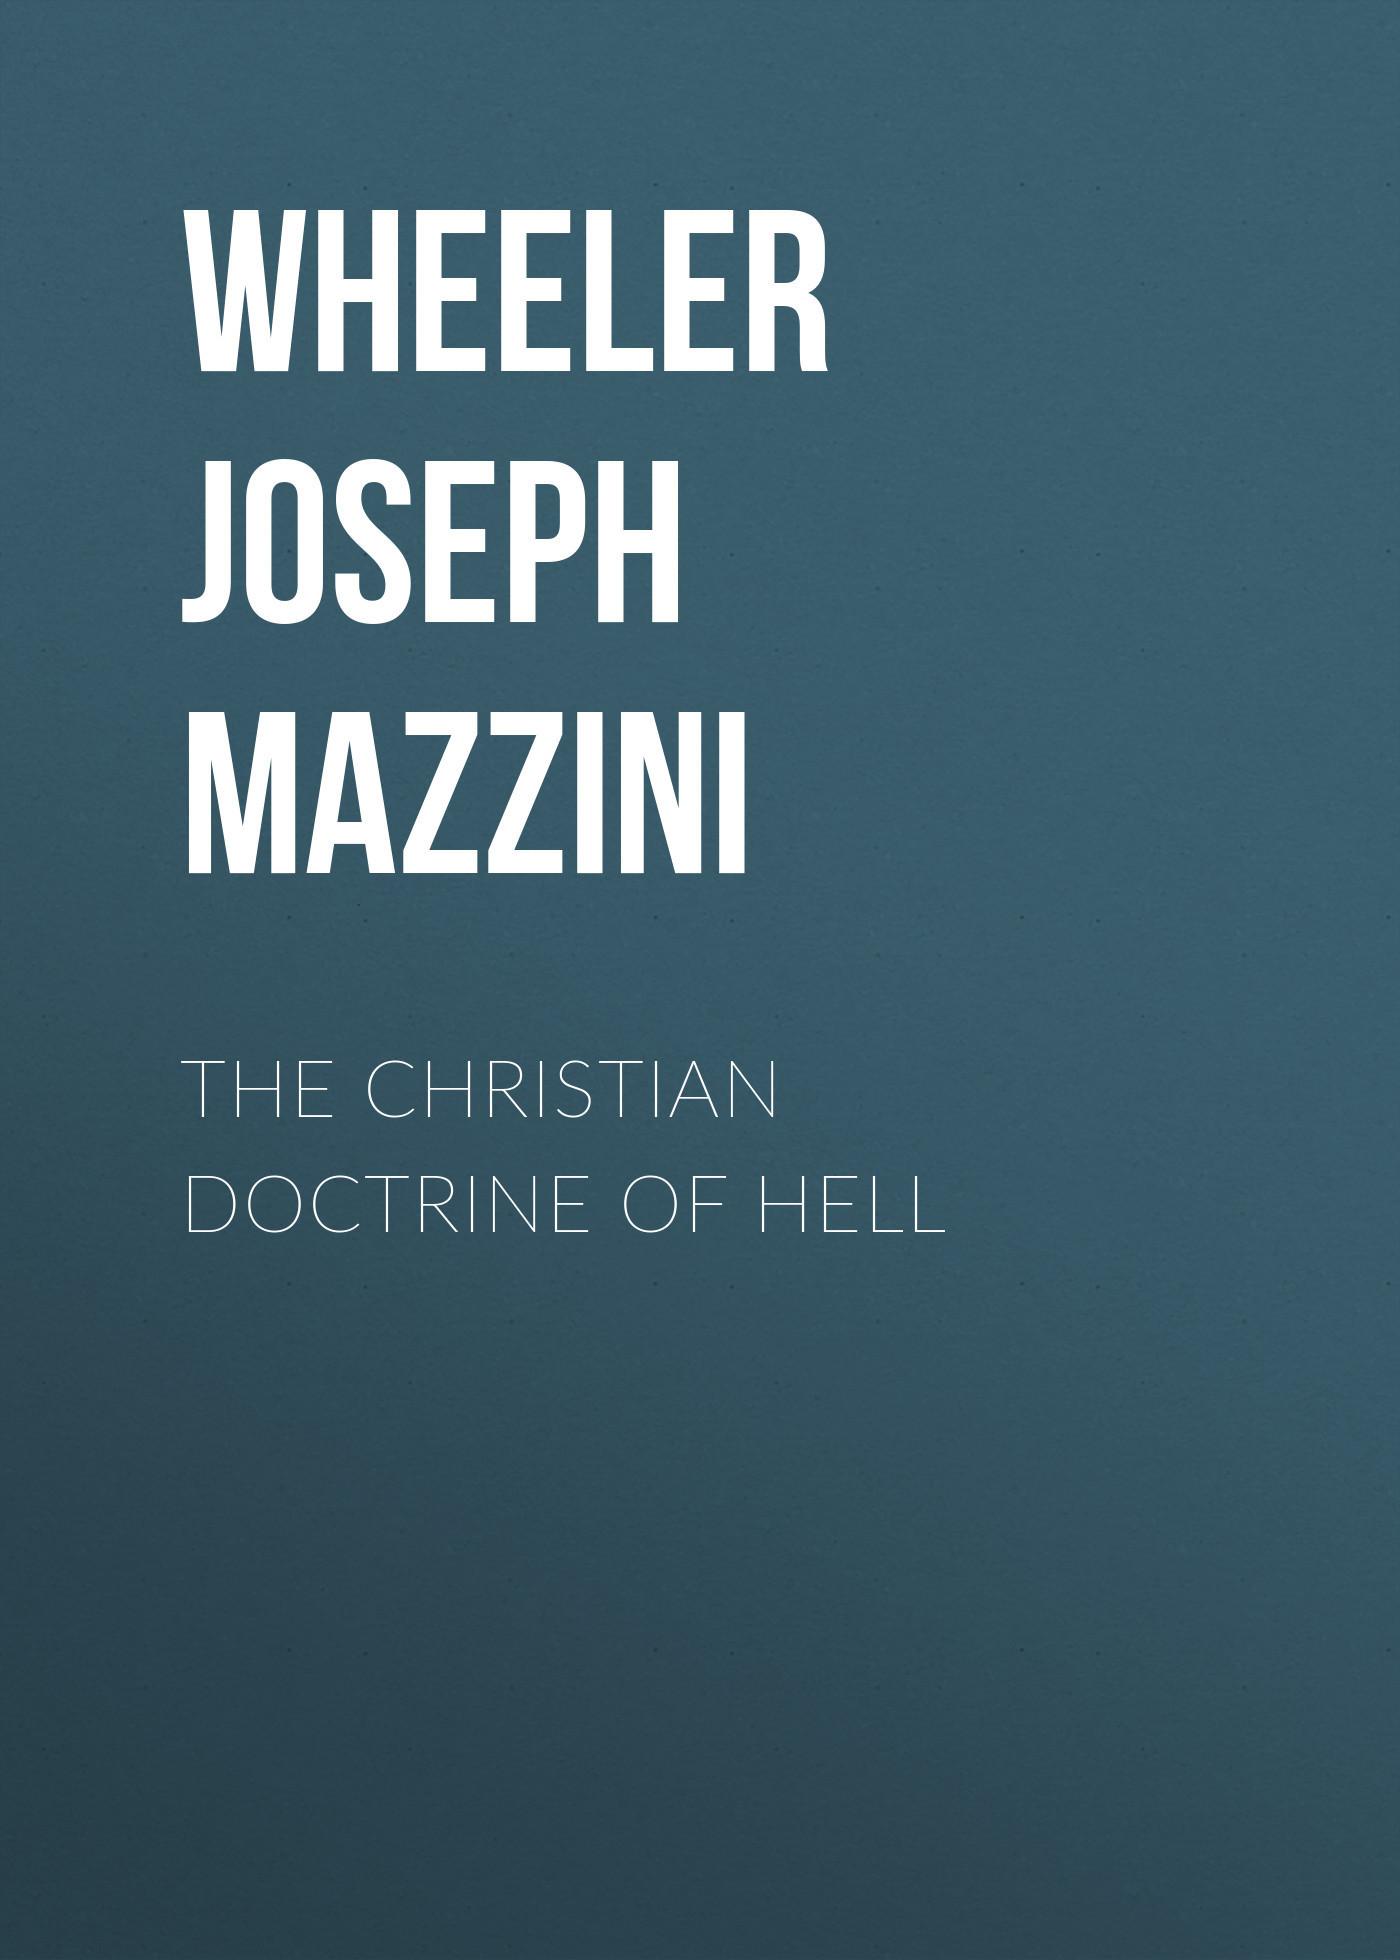 Wheeler Joseph Mazzini The Christian Doctrine of Hell bprd hell on earth v 7